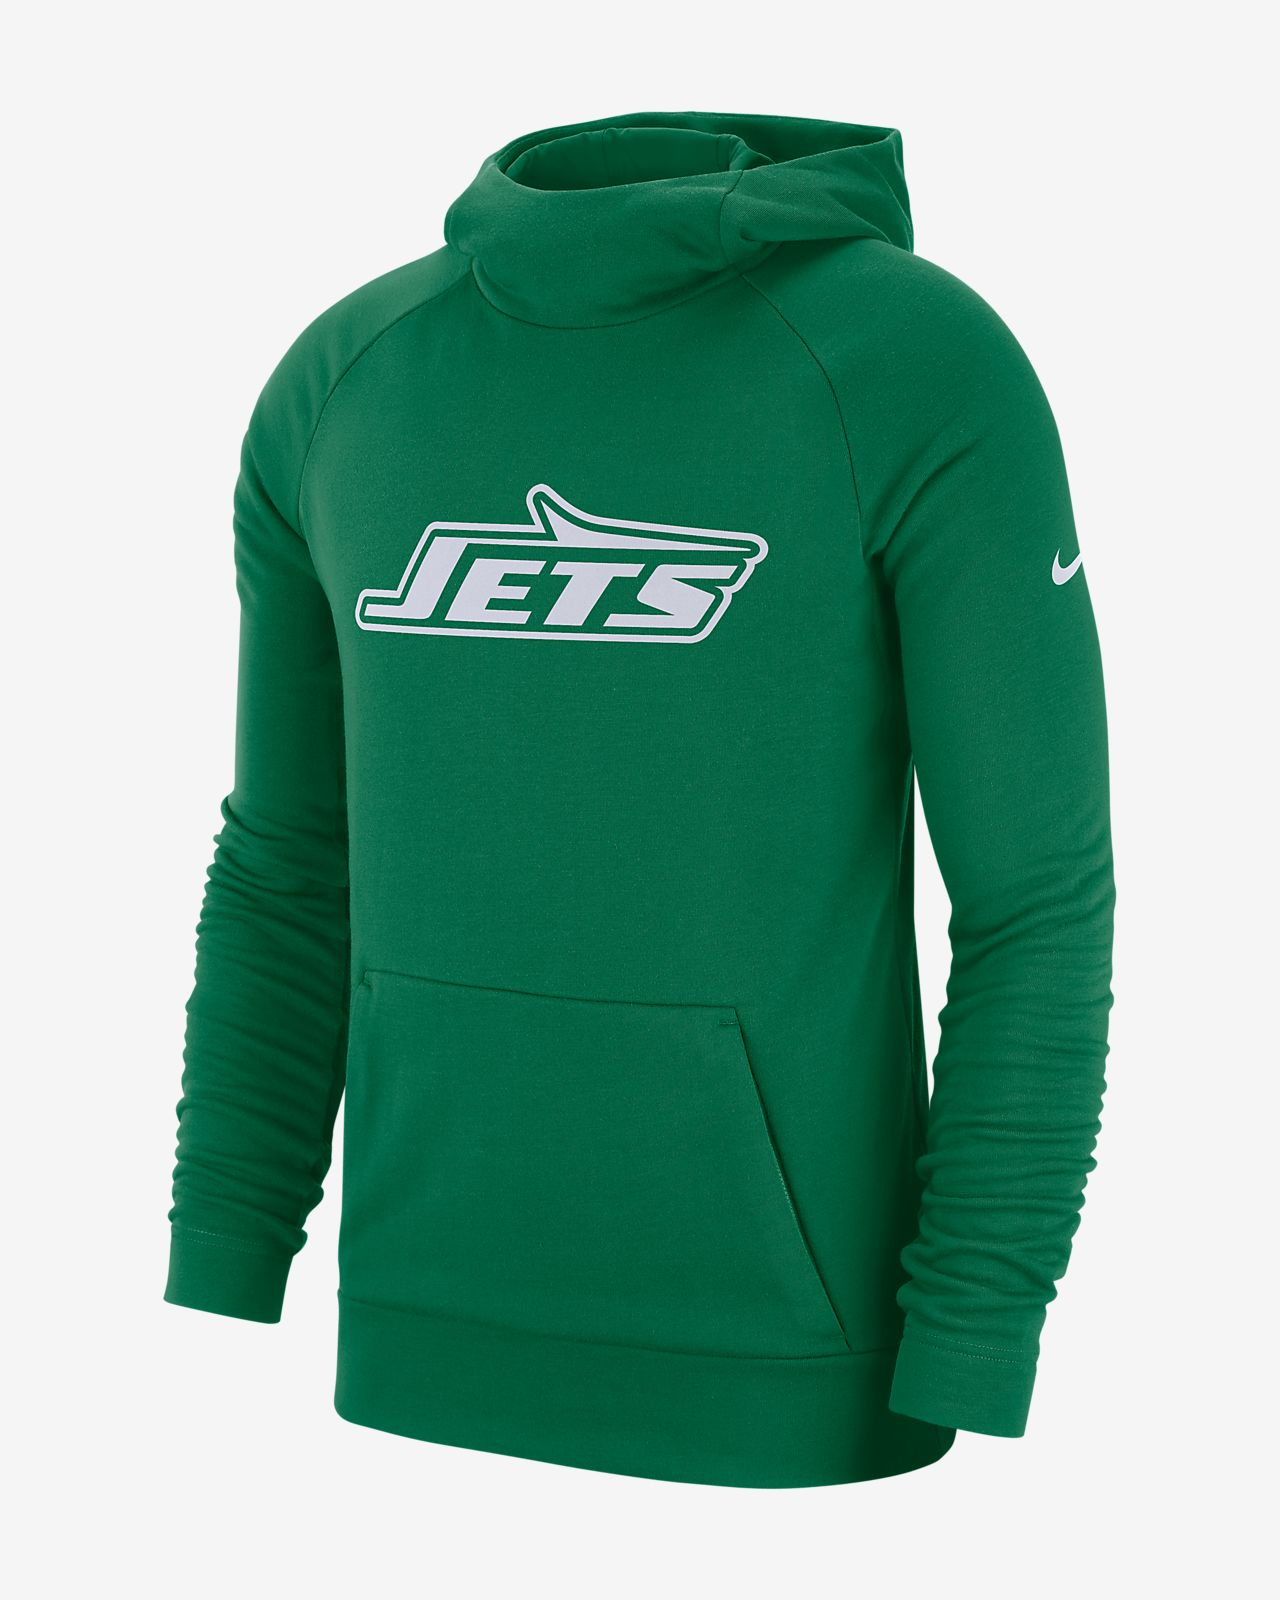 Nike Dri-FIT (NFL Jets) Men s Pullover Hoodie. Nike.com 1eed7ffef